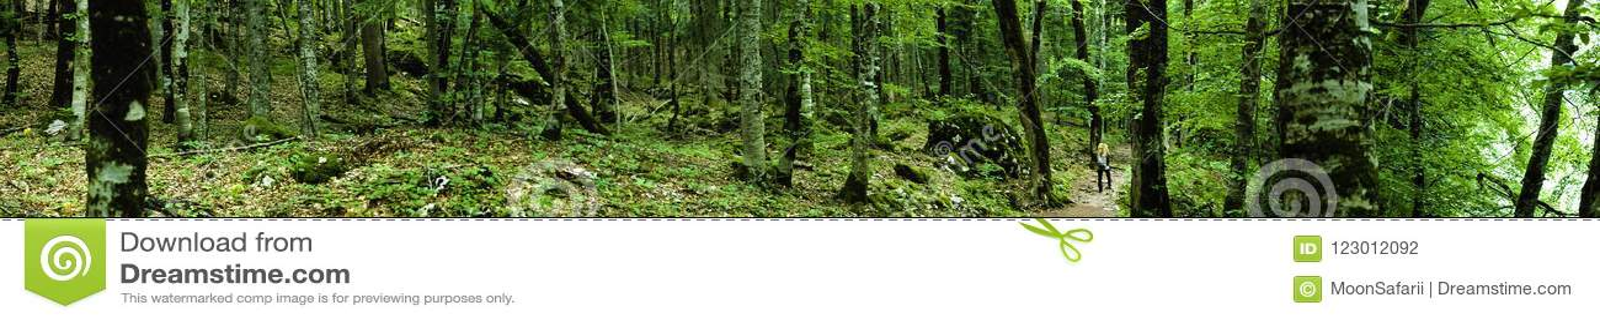 Panorama extremamente largo da floresta profunda